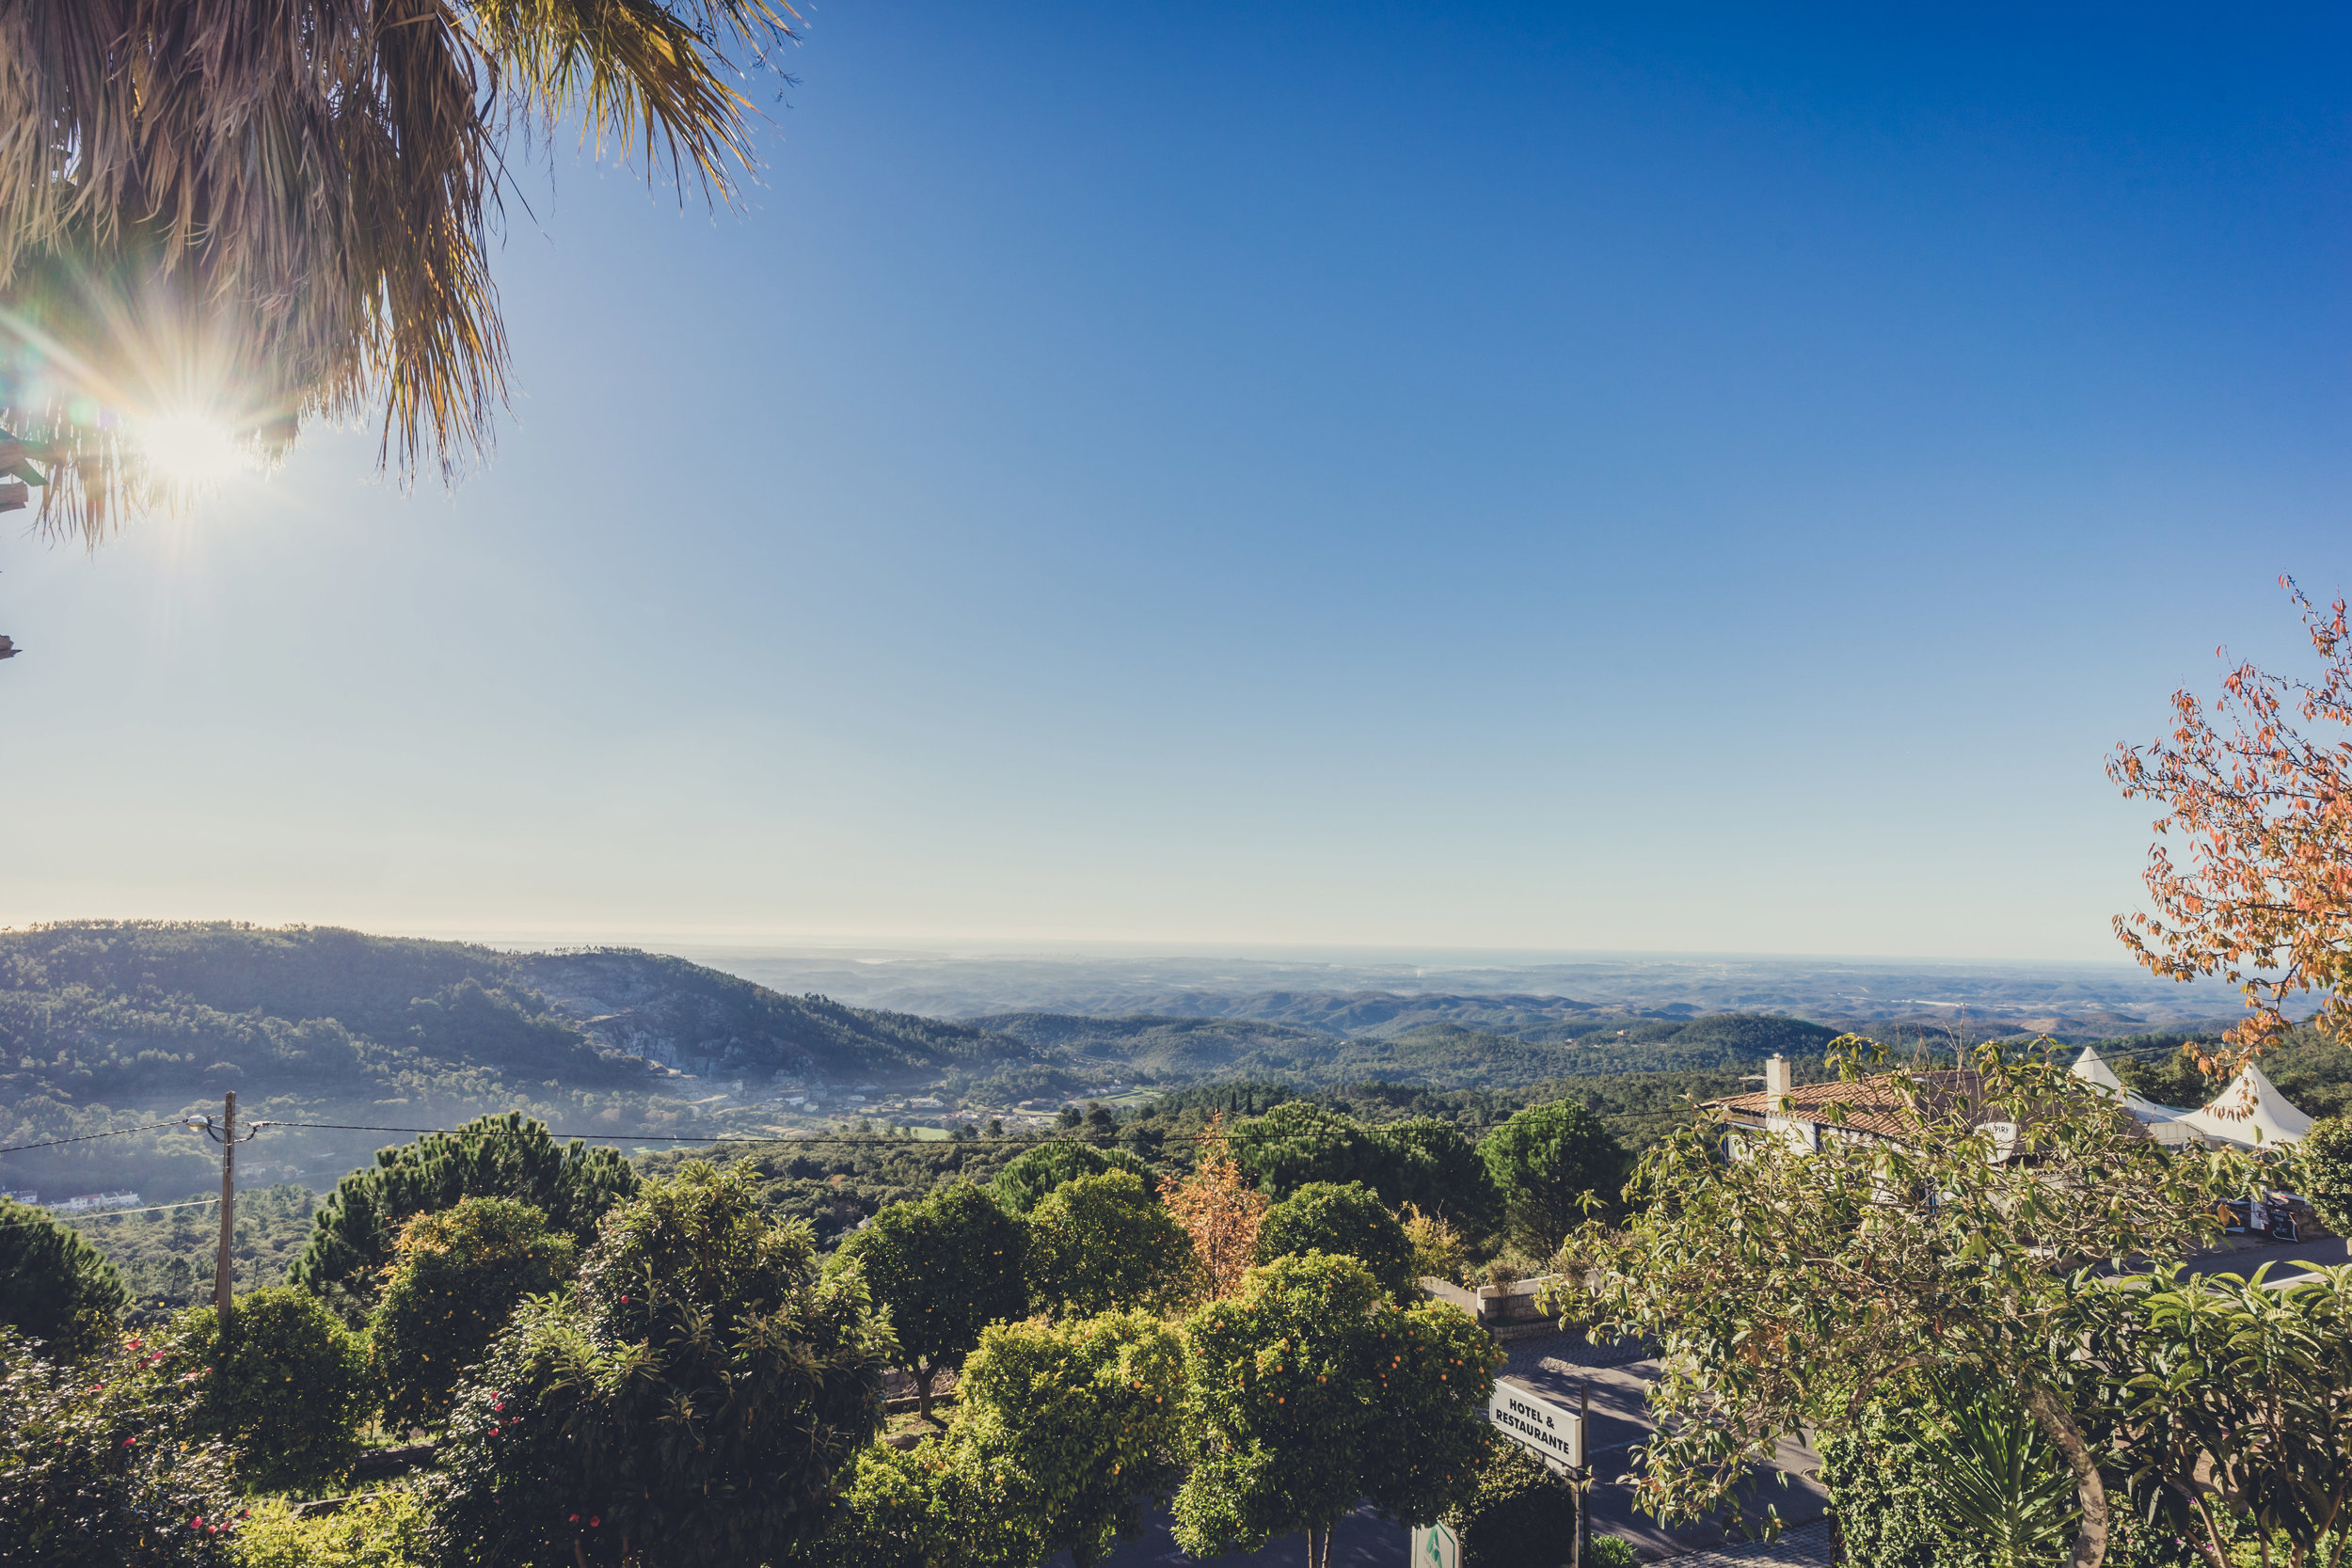 estalagem abrigo da montanha monchique portugal. view from the room. room with a view. great view from the room. big hotel...jpg